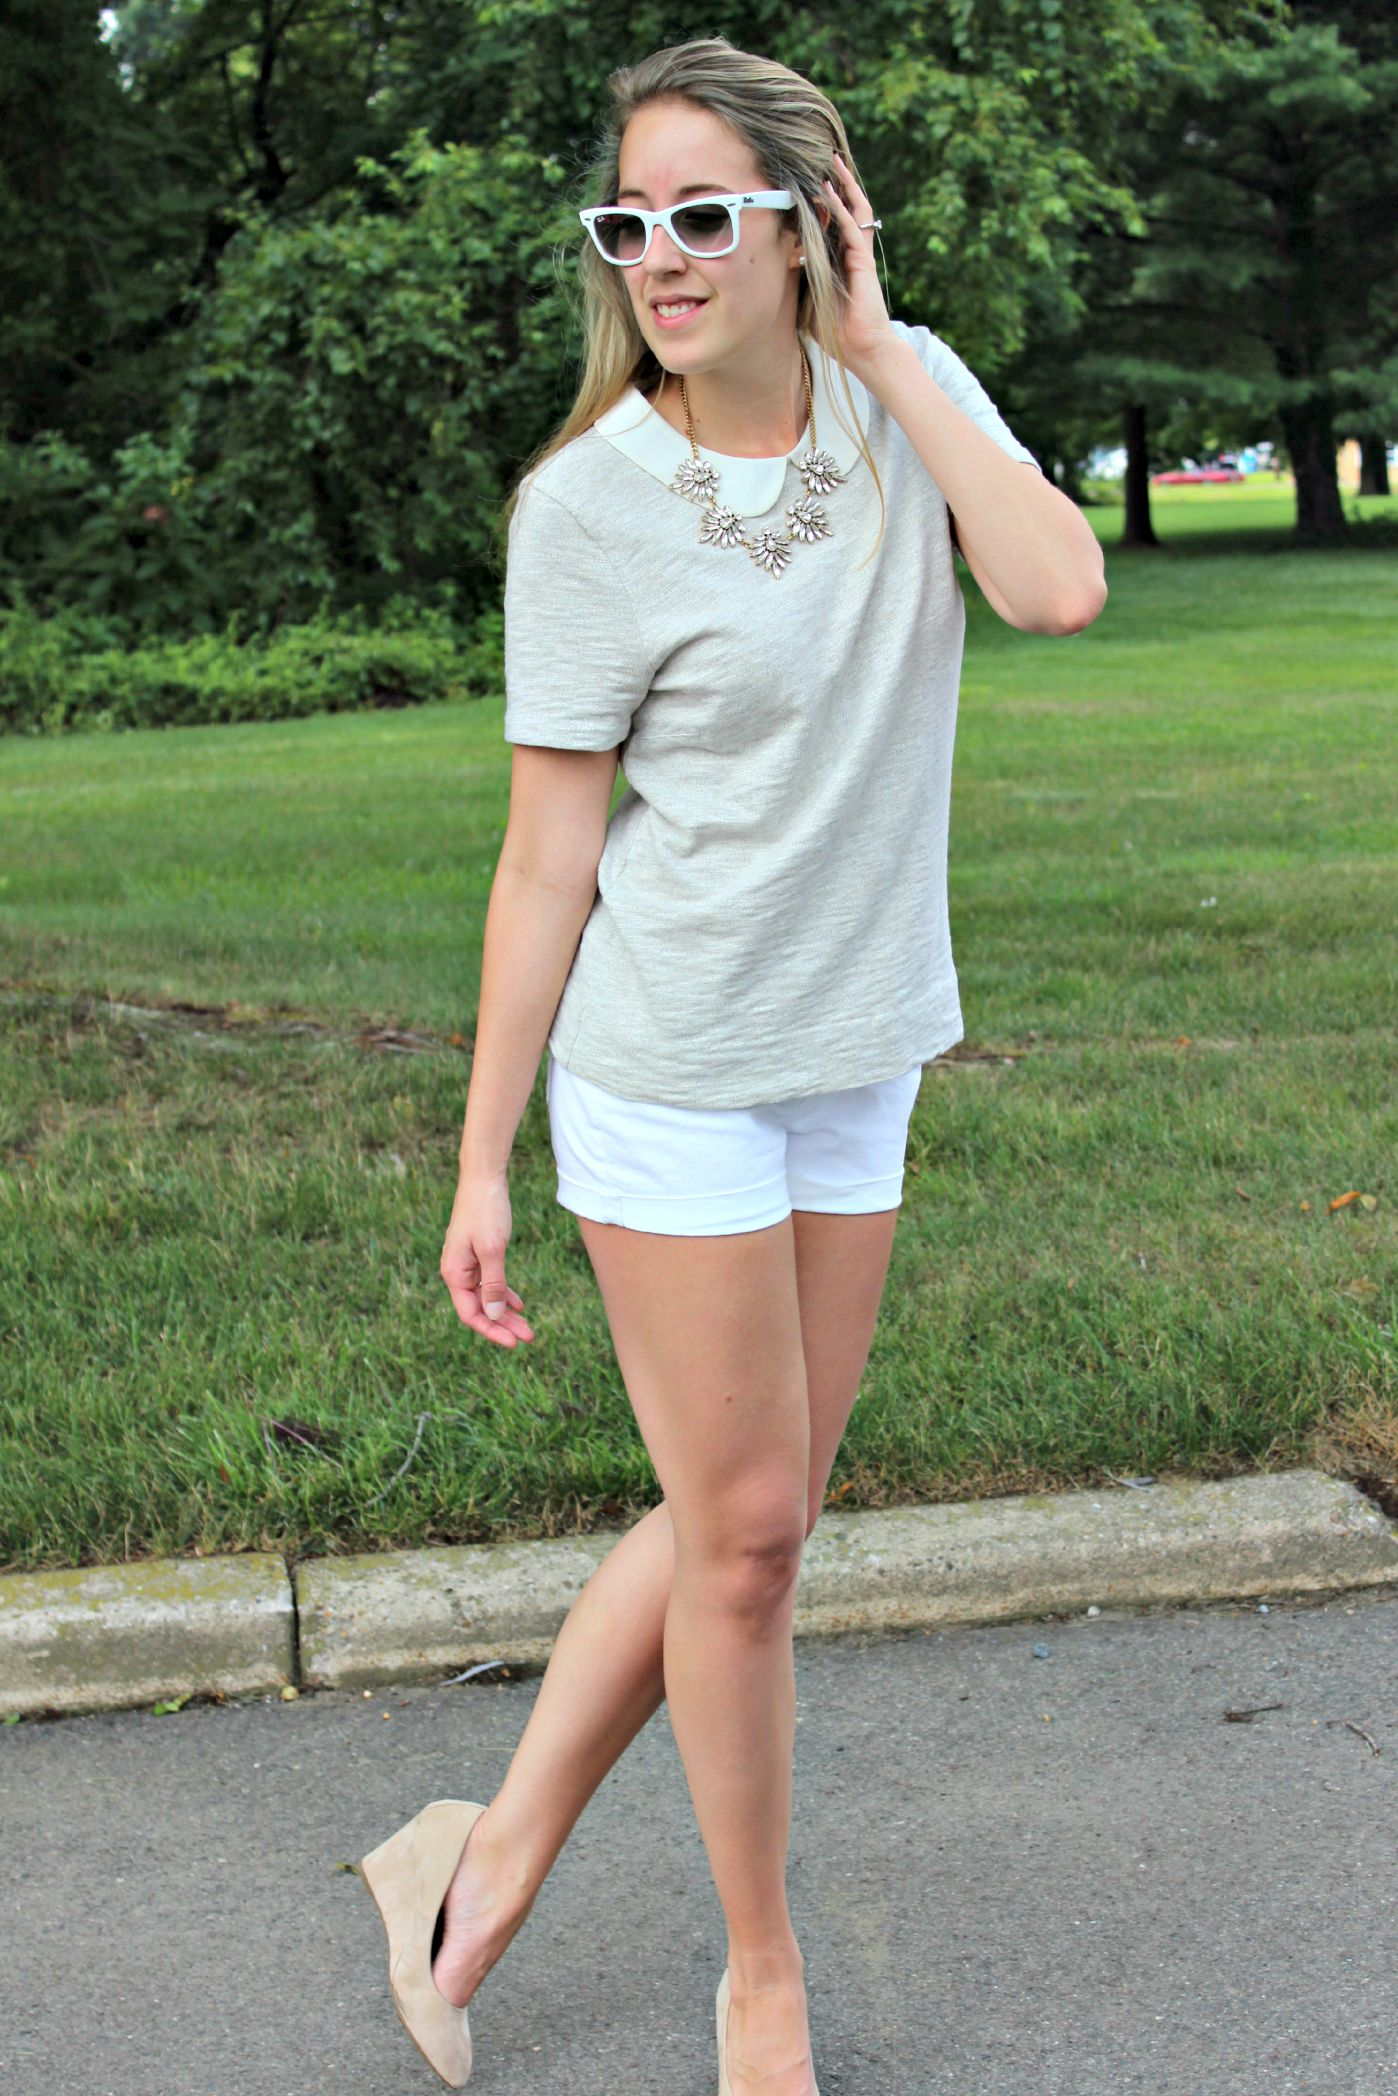 Wearing: Summer Lady